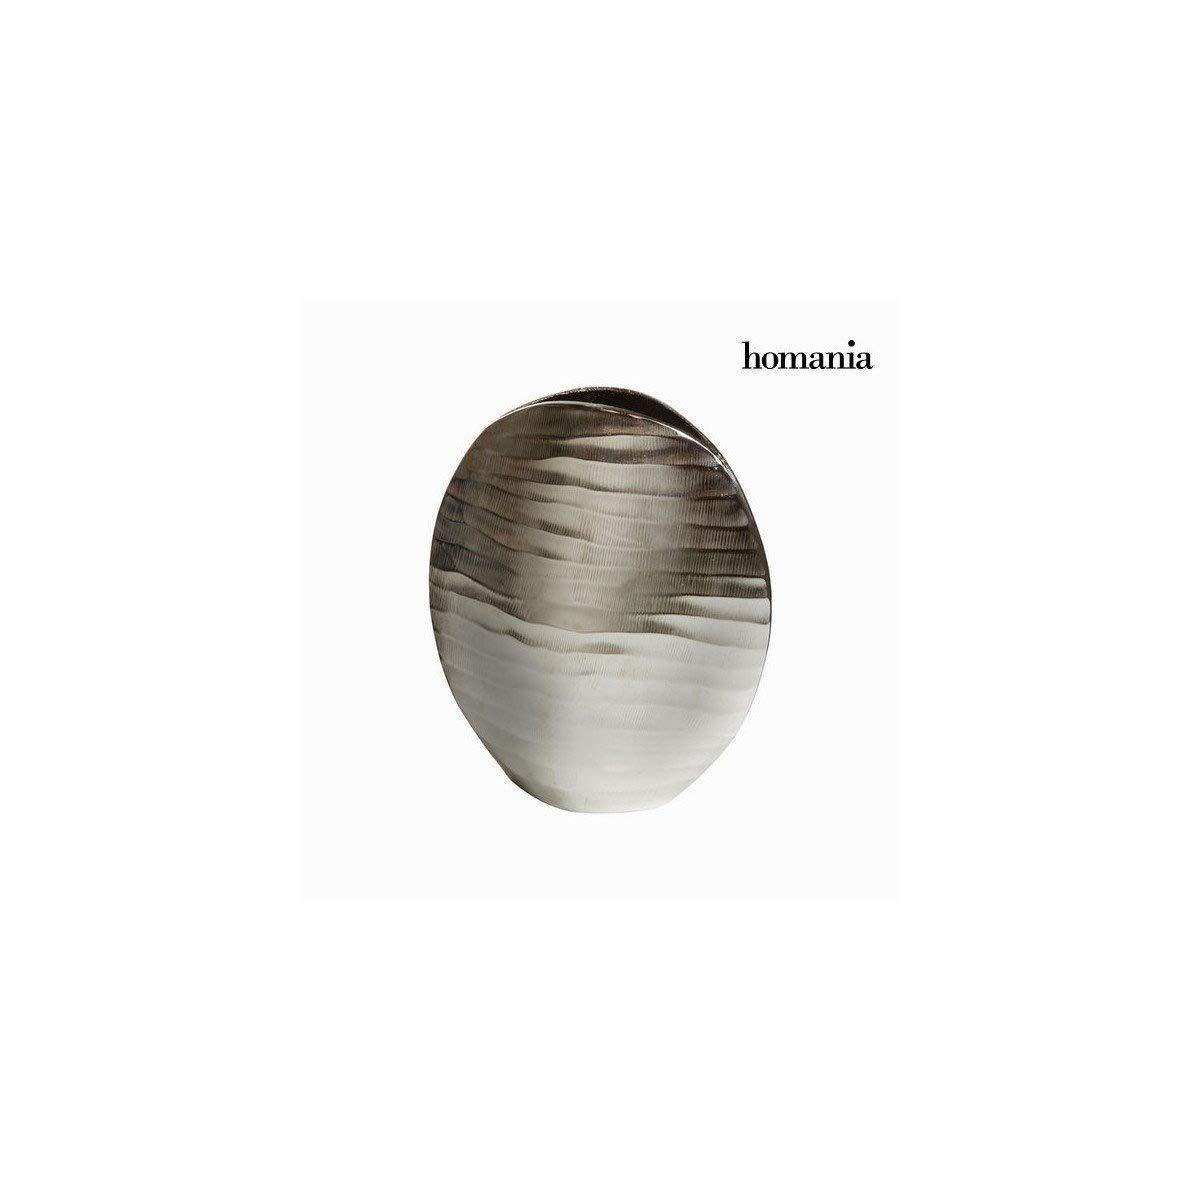 Vaso ovale nichel - New York Collezione by by by Homania (1000026975) 4b33b9